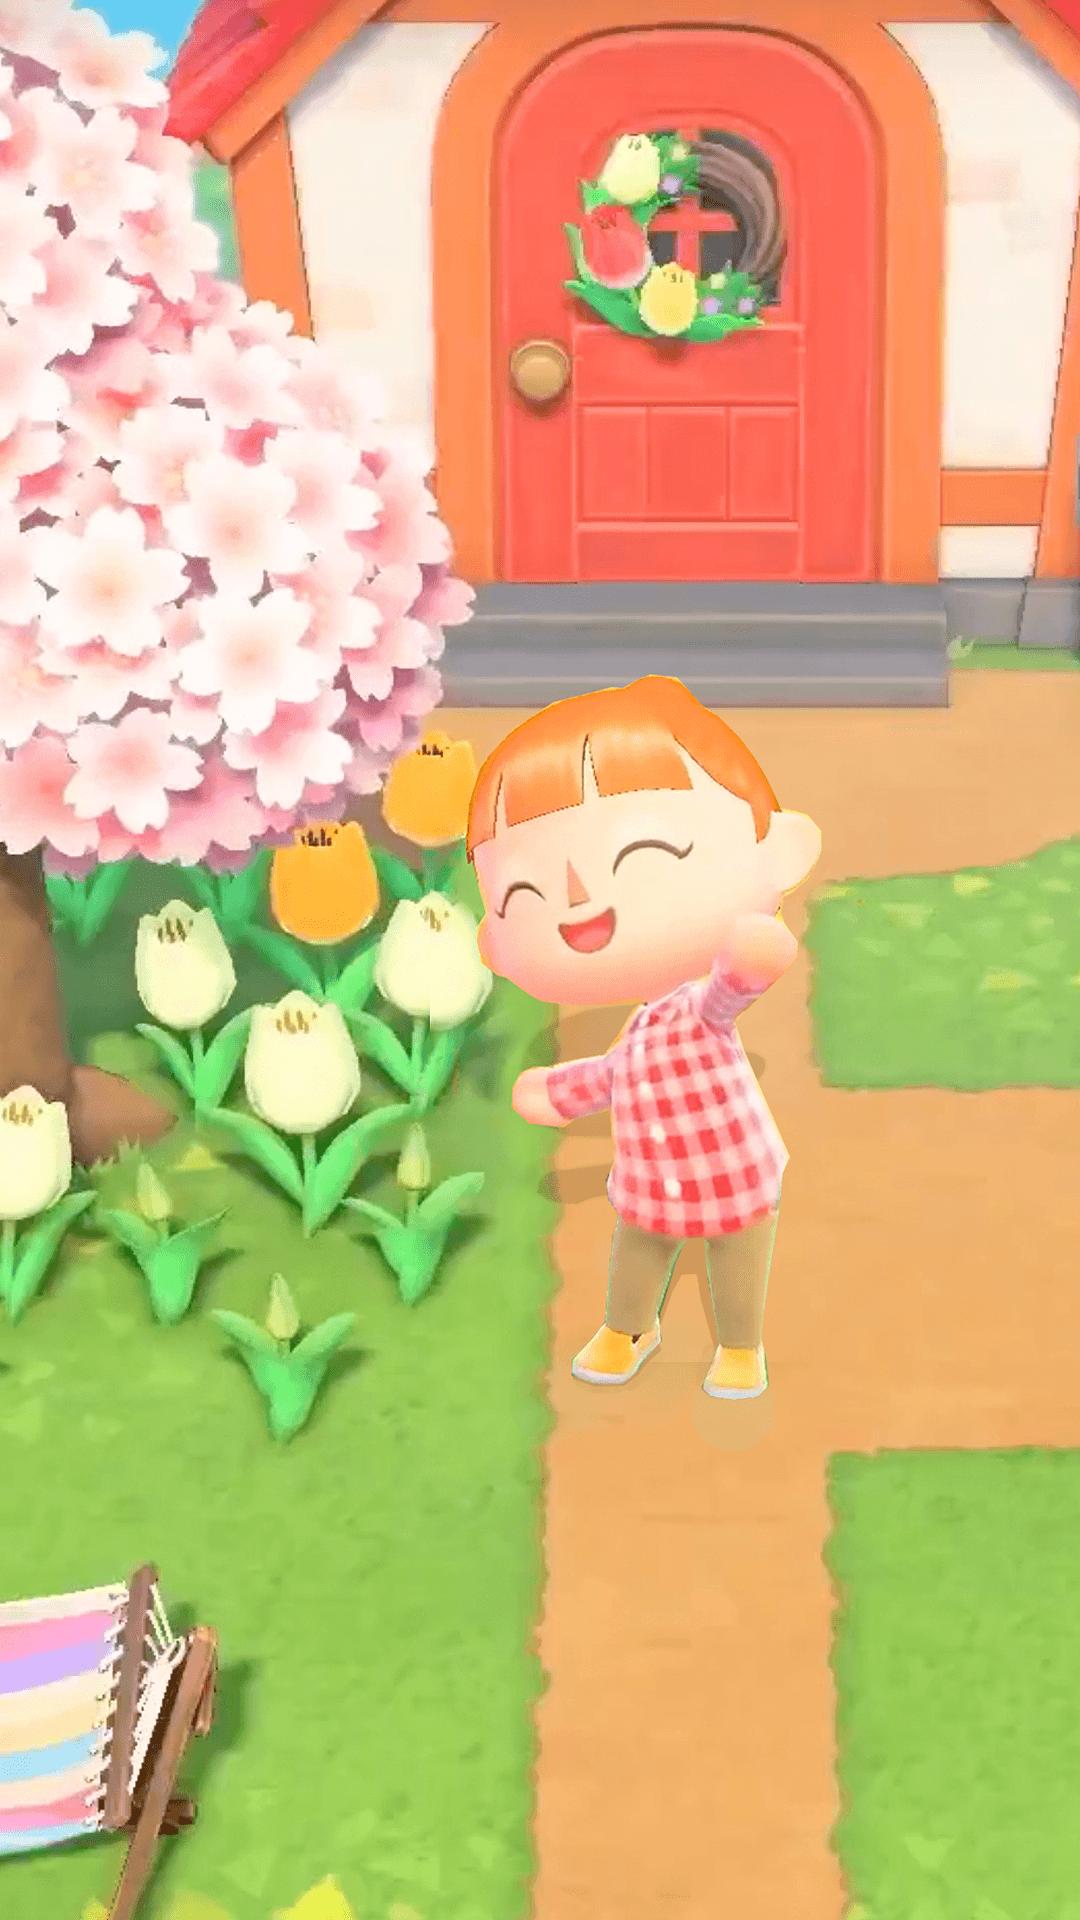 Animal Crossing New Horizons Wallpapers Wallpaper Cave